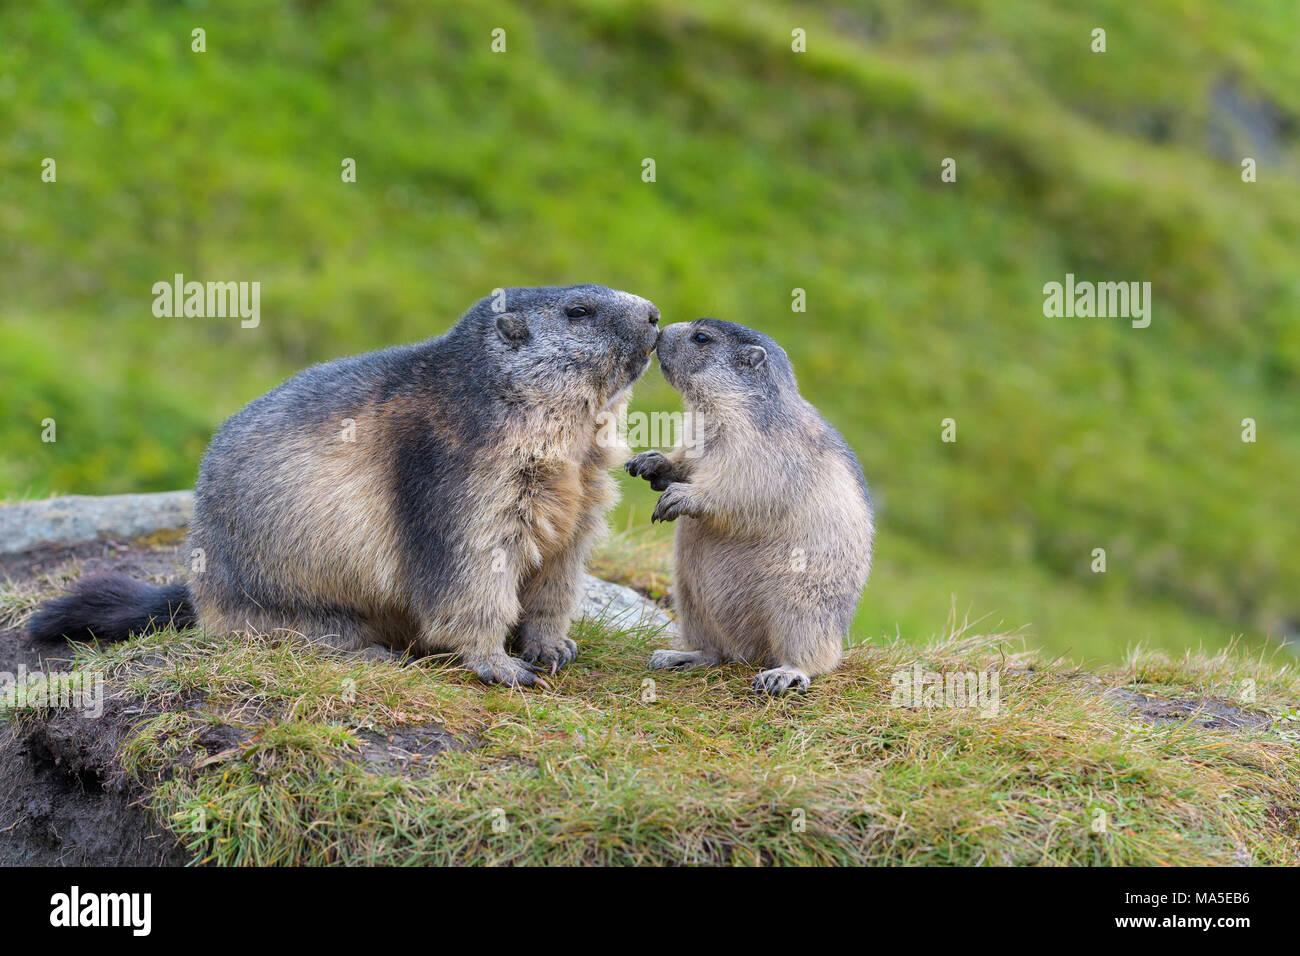 Alpine Marmot, Marmota marmota, adult with young, Hohe Tauern National park, Austria - Stock Image